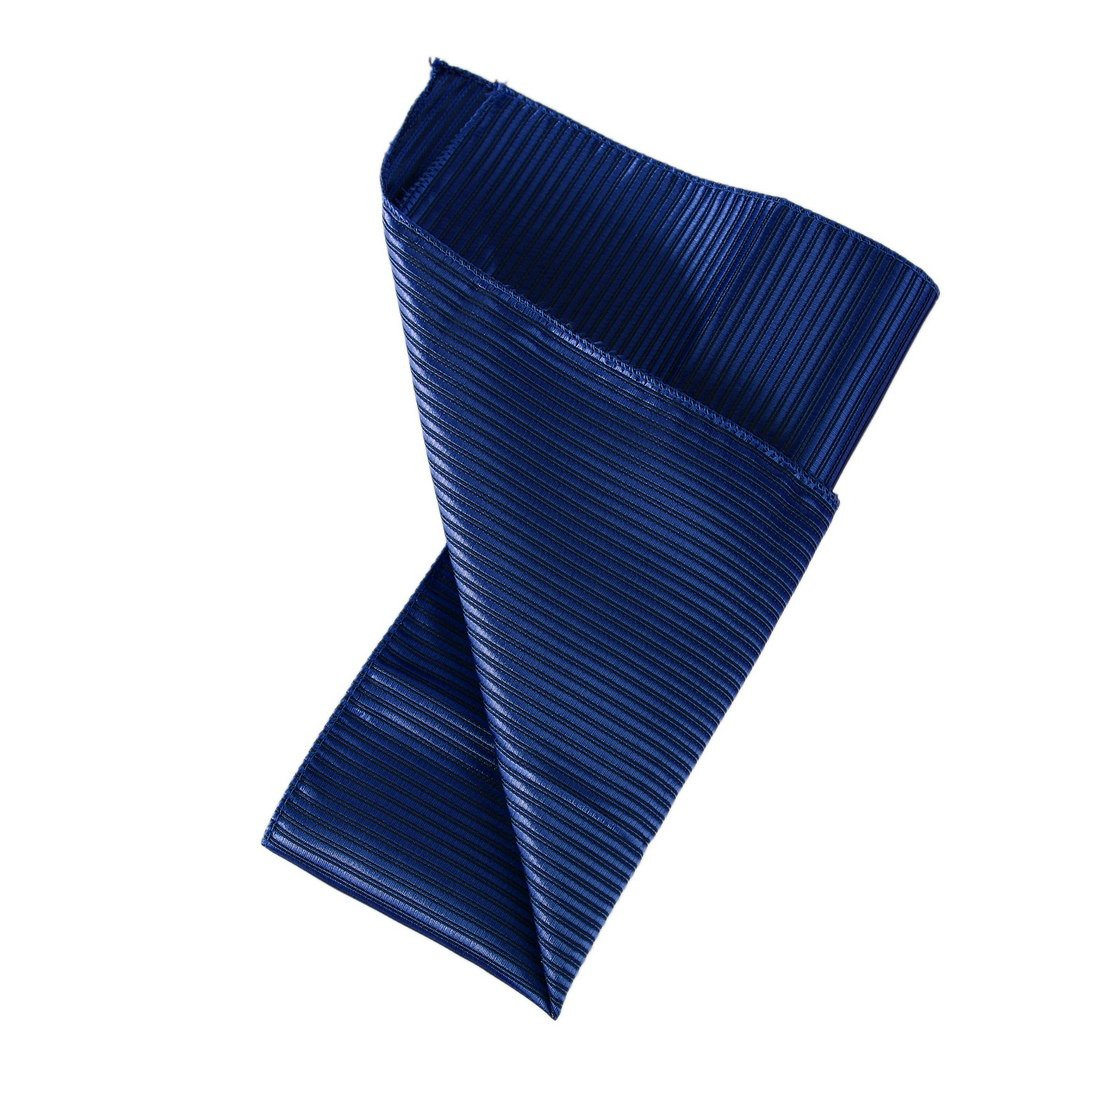 Dan Smith Mens Fashion Multicolored Stripes Pocket Square Microfiber Hanky With Free Gift Box